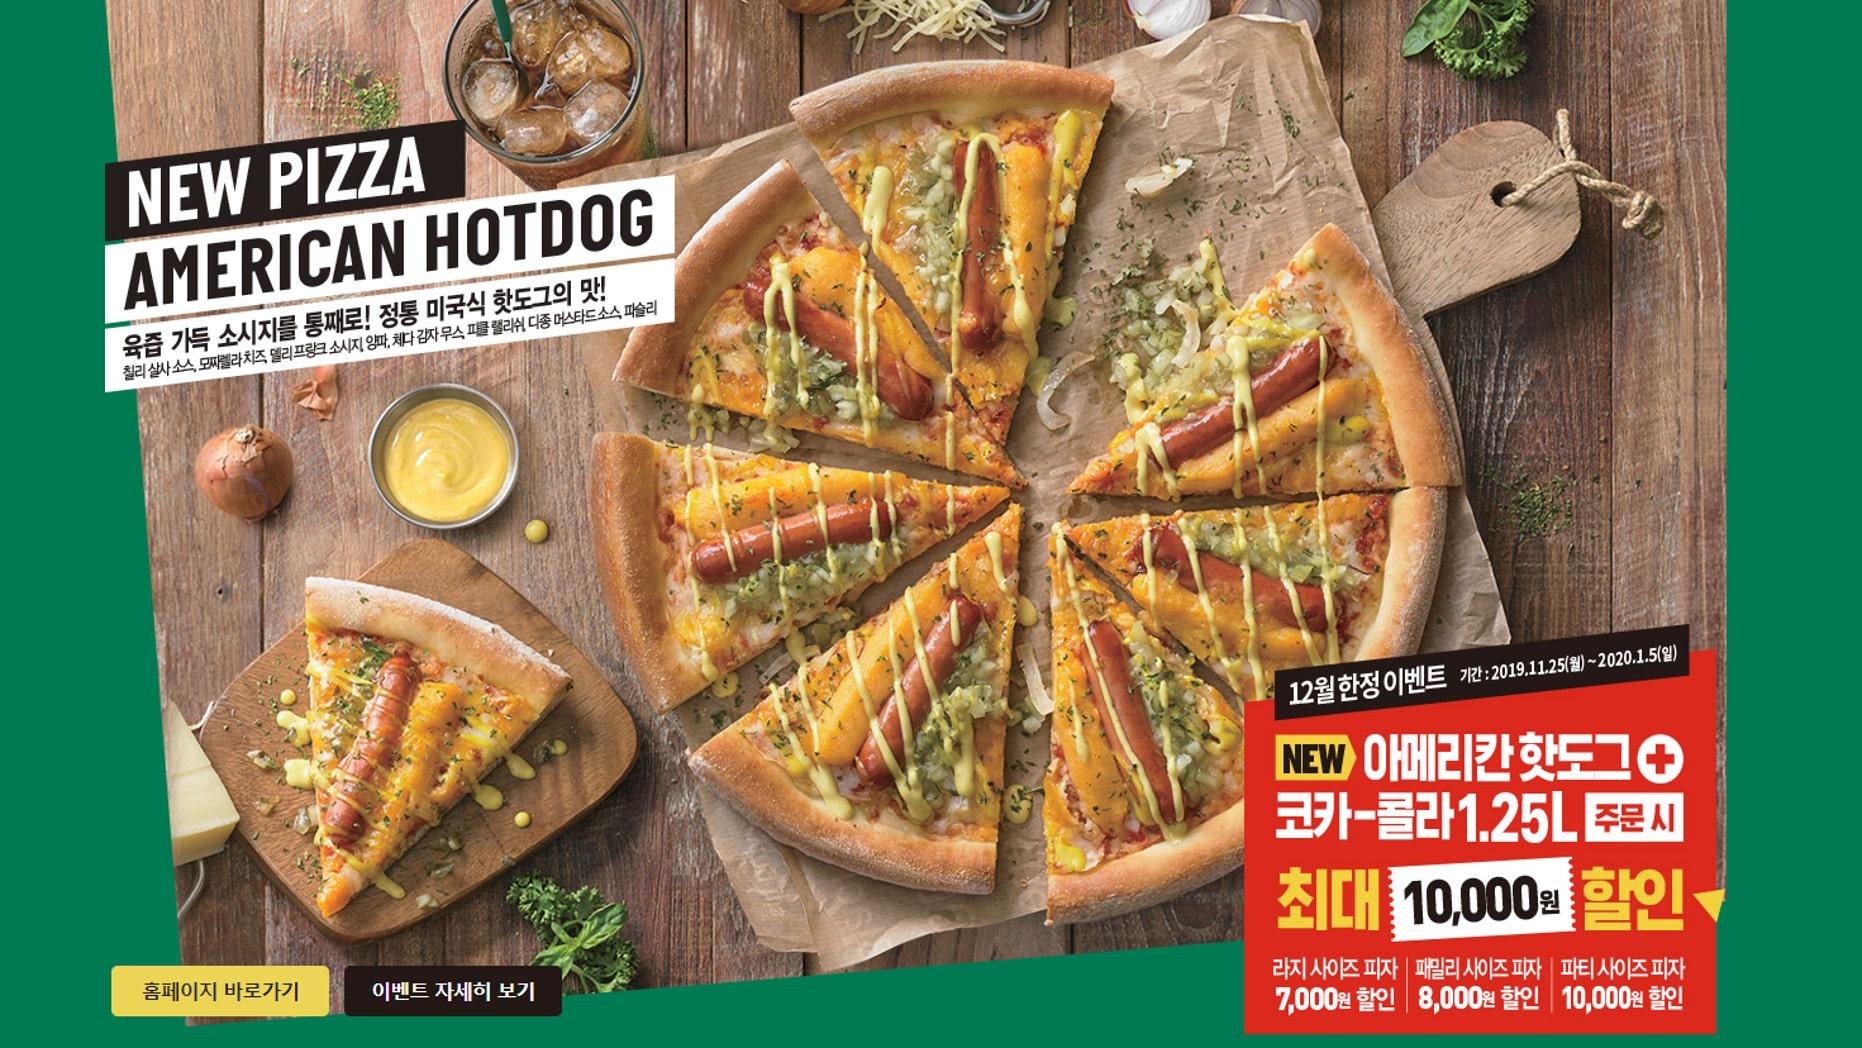 PapaJohnsAmericanHotdogPizza.jpg